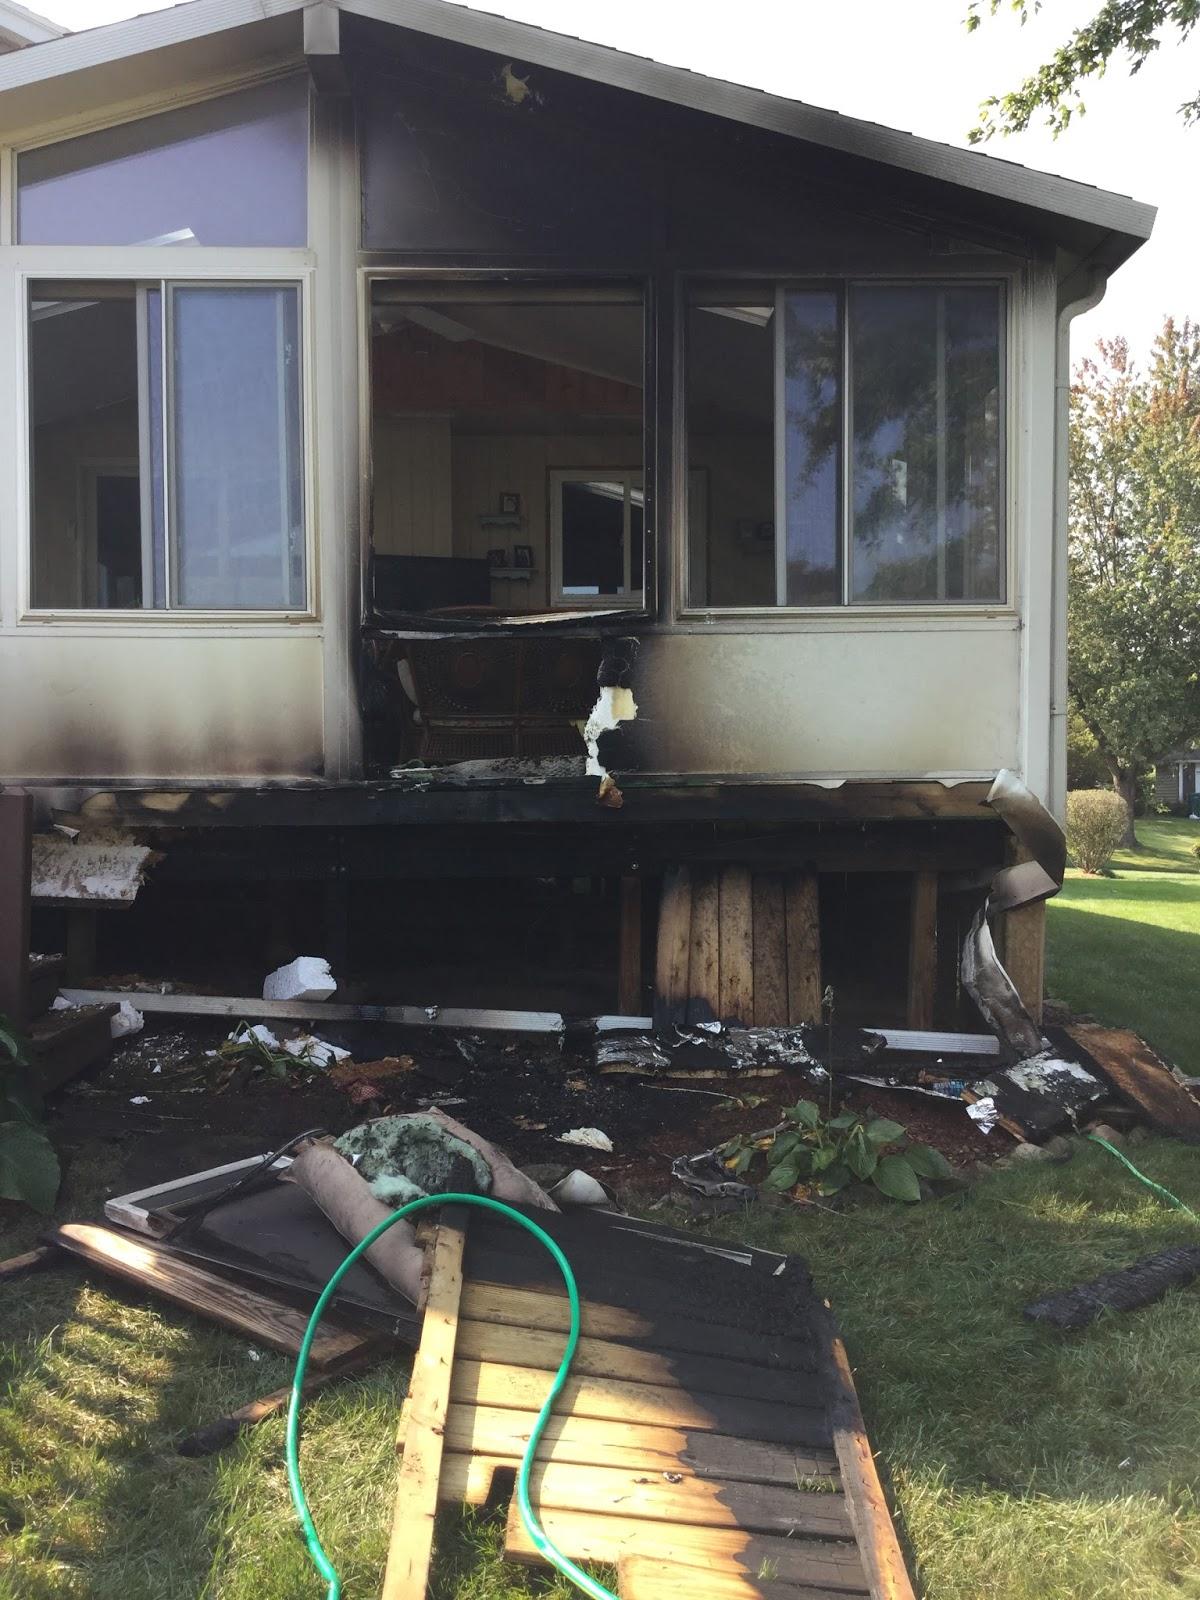 penfield fire company september 2015